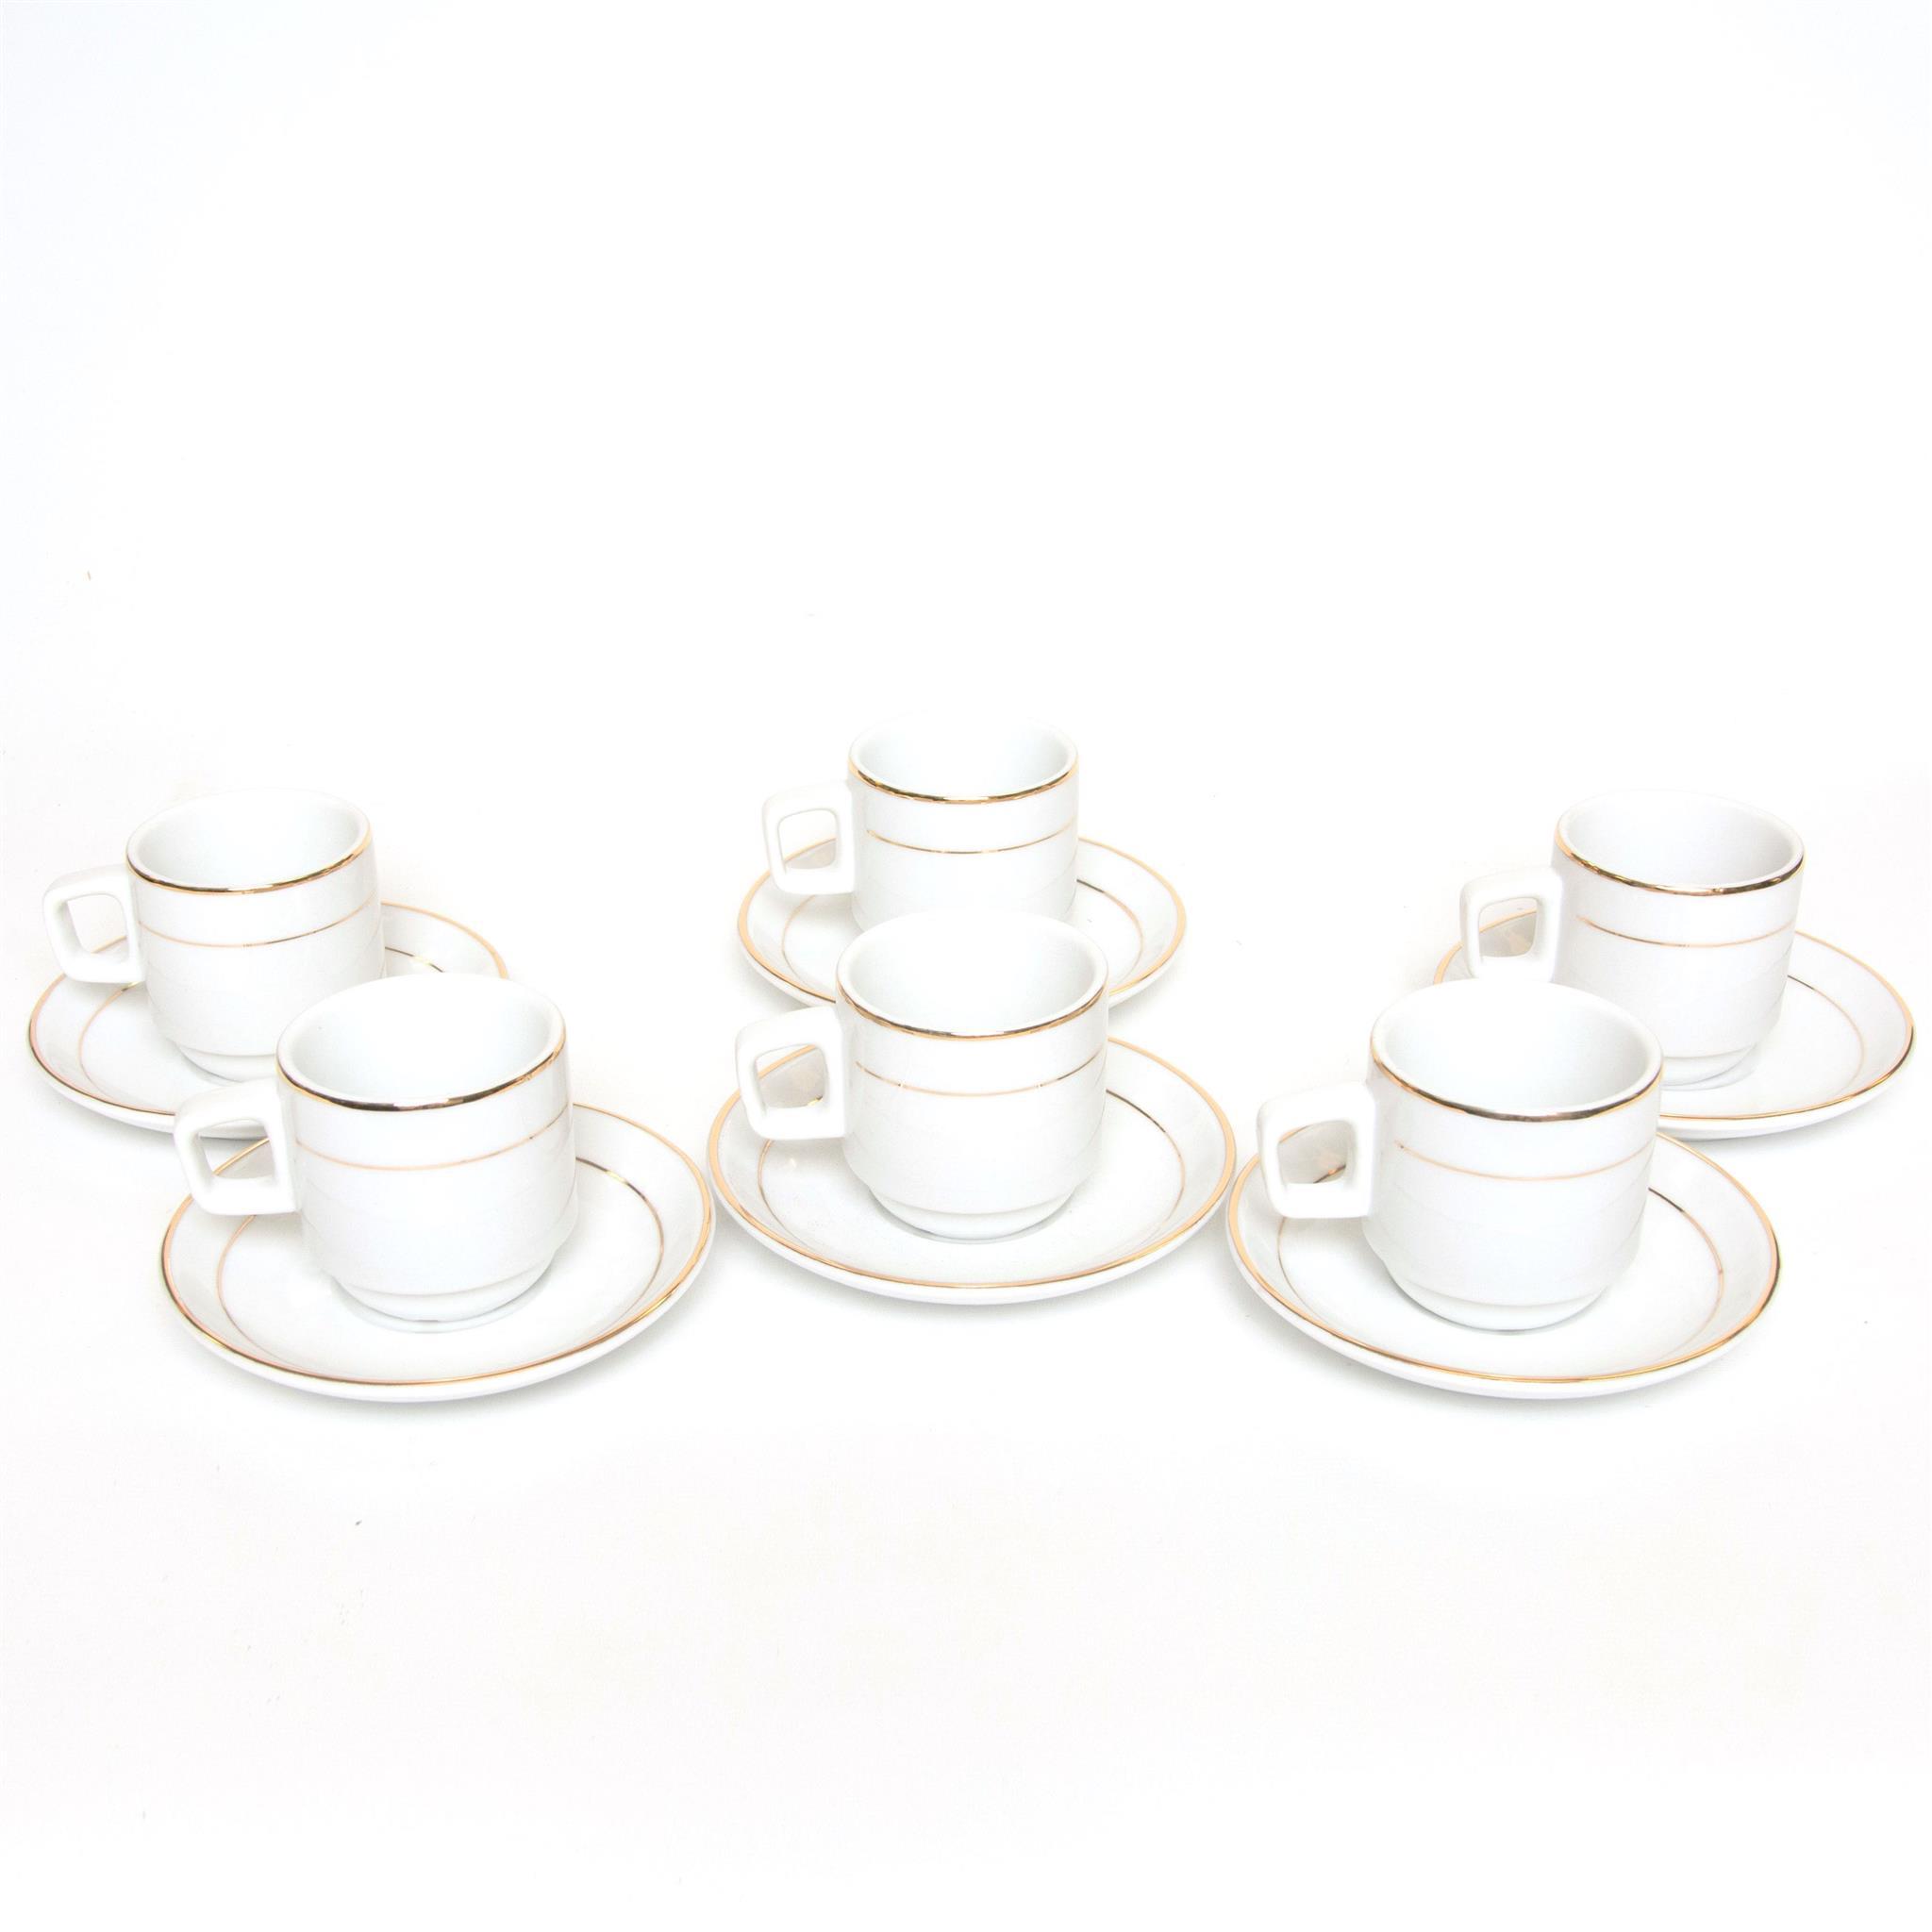 (12056) Gold Rim Expresso Cup/Saucer Set/6